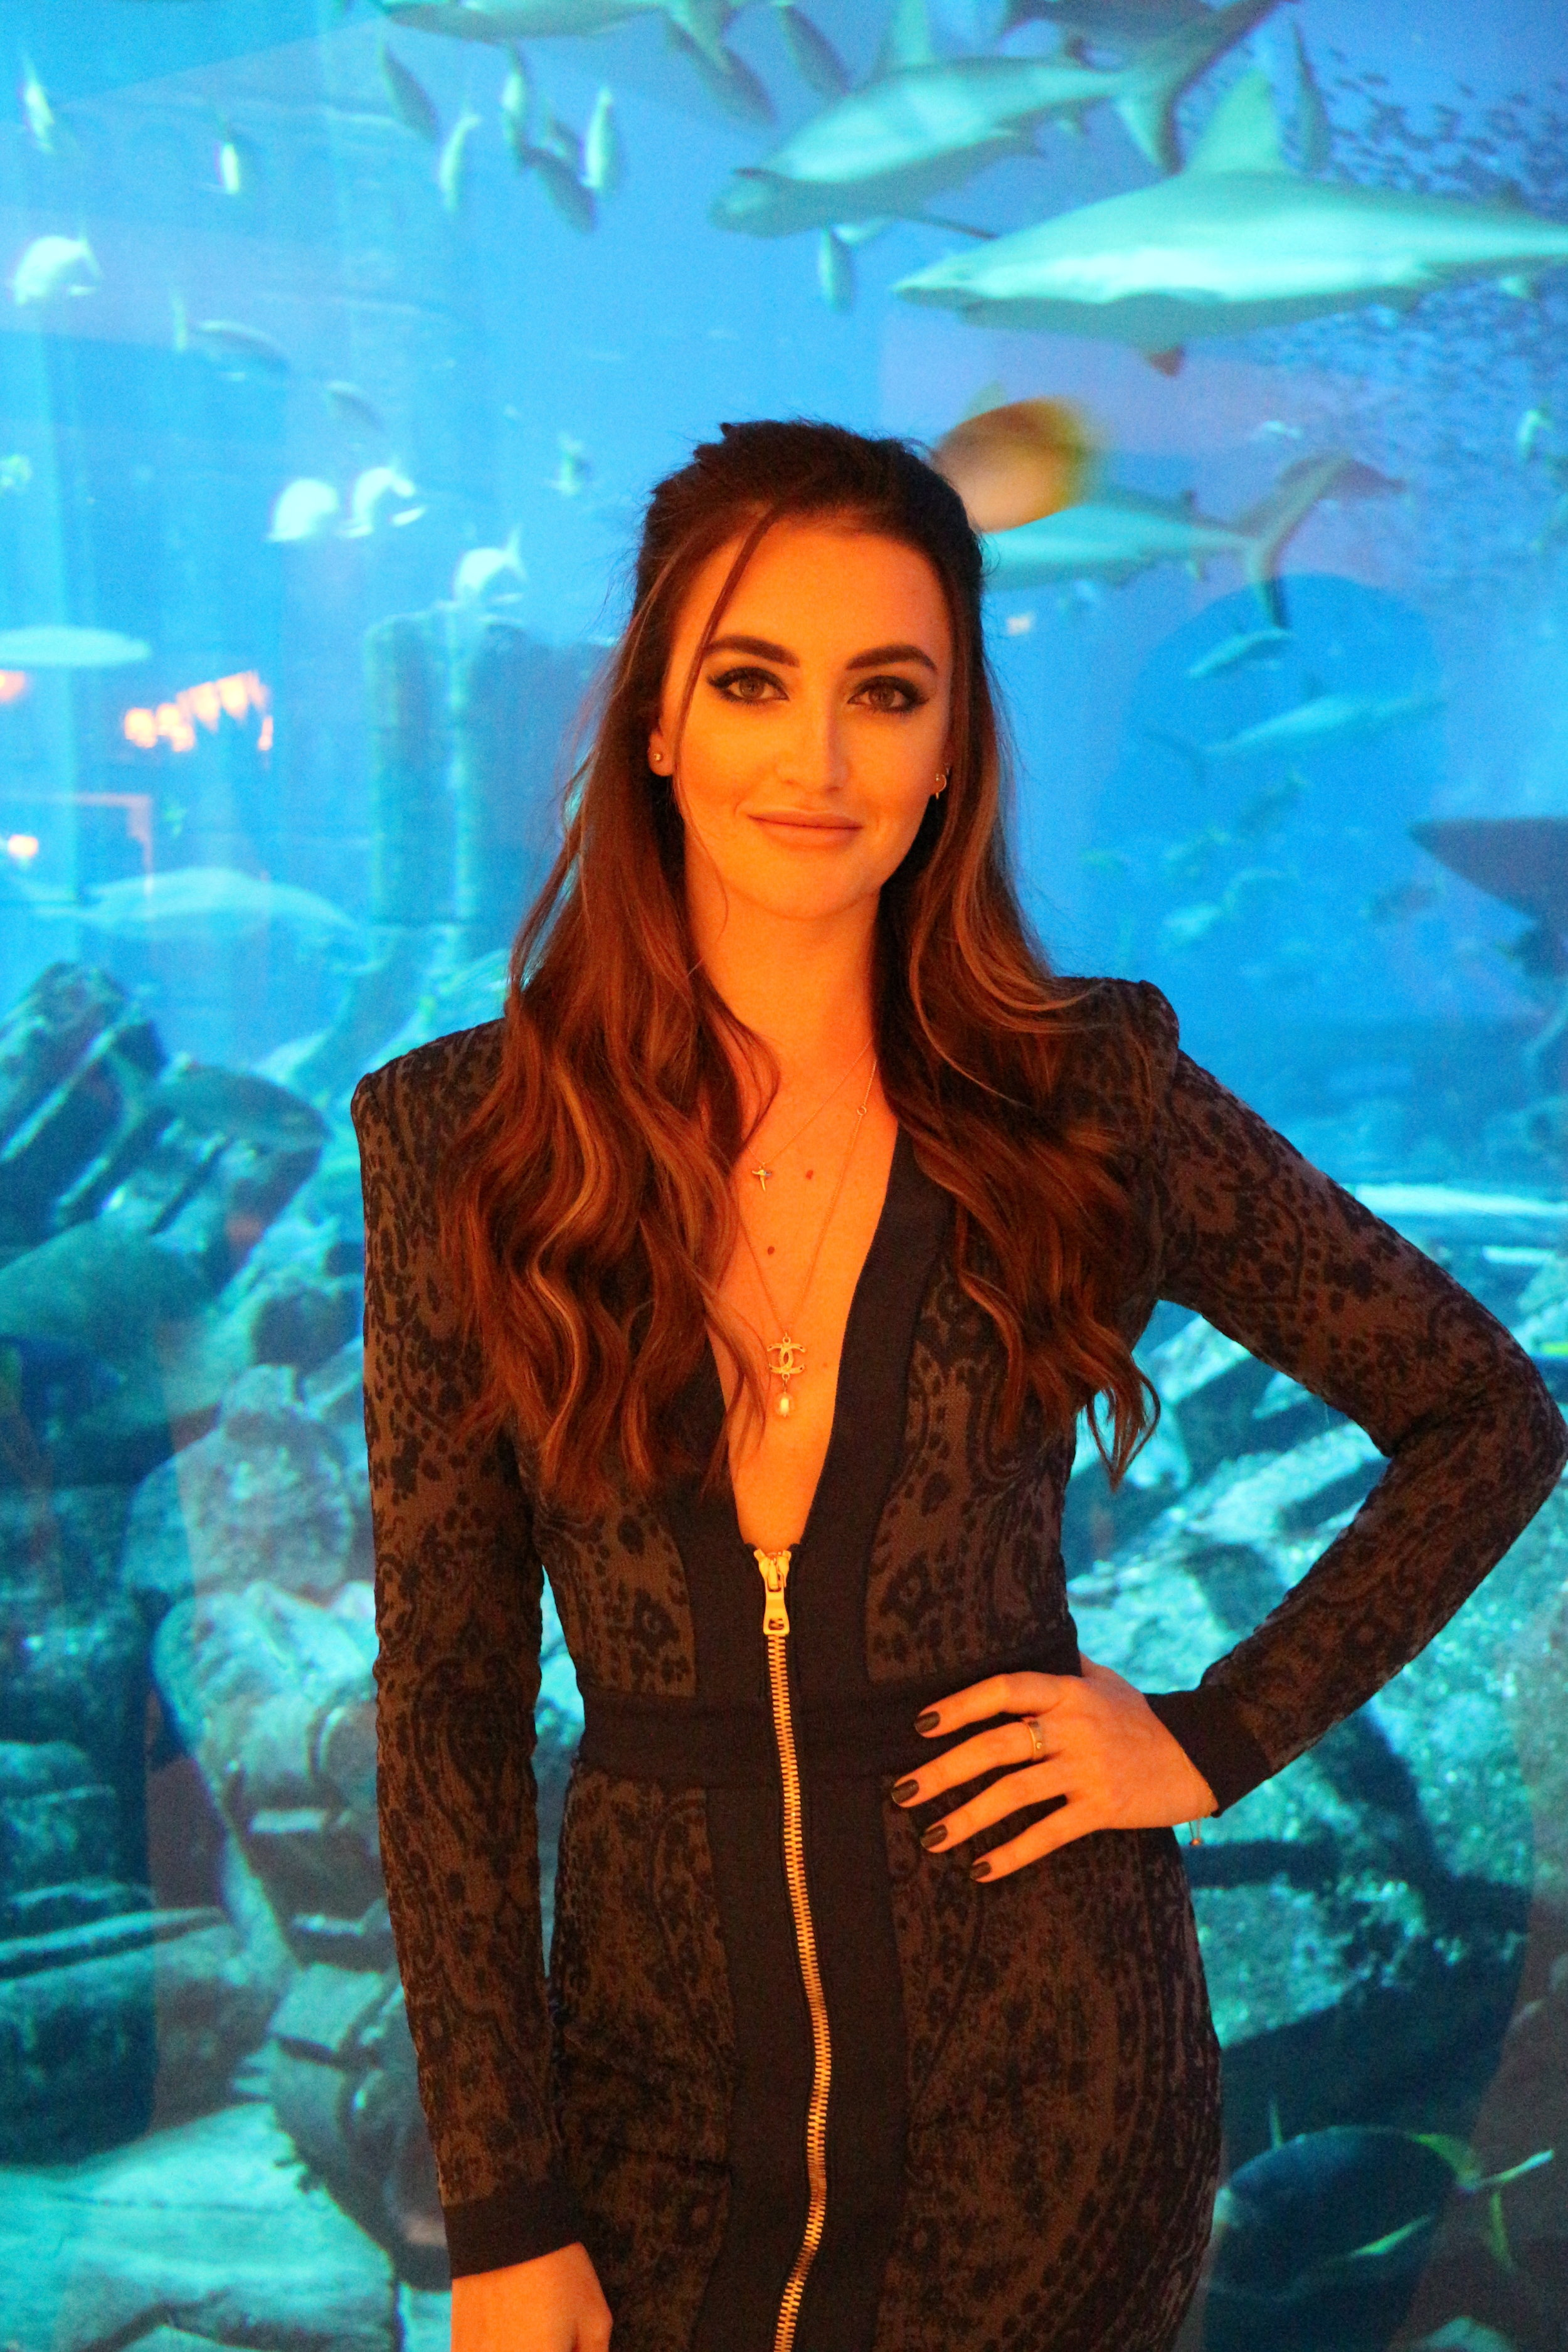 Just loving my Balmain dress at the Atlantis...